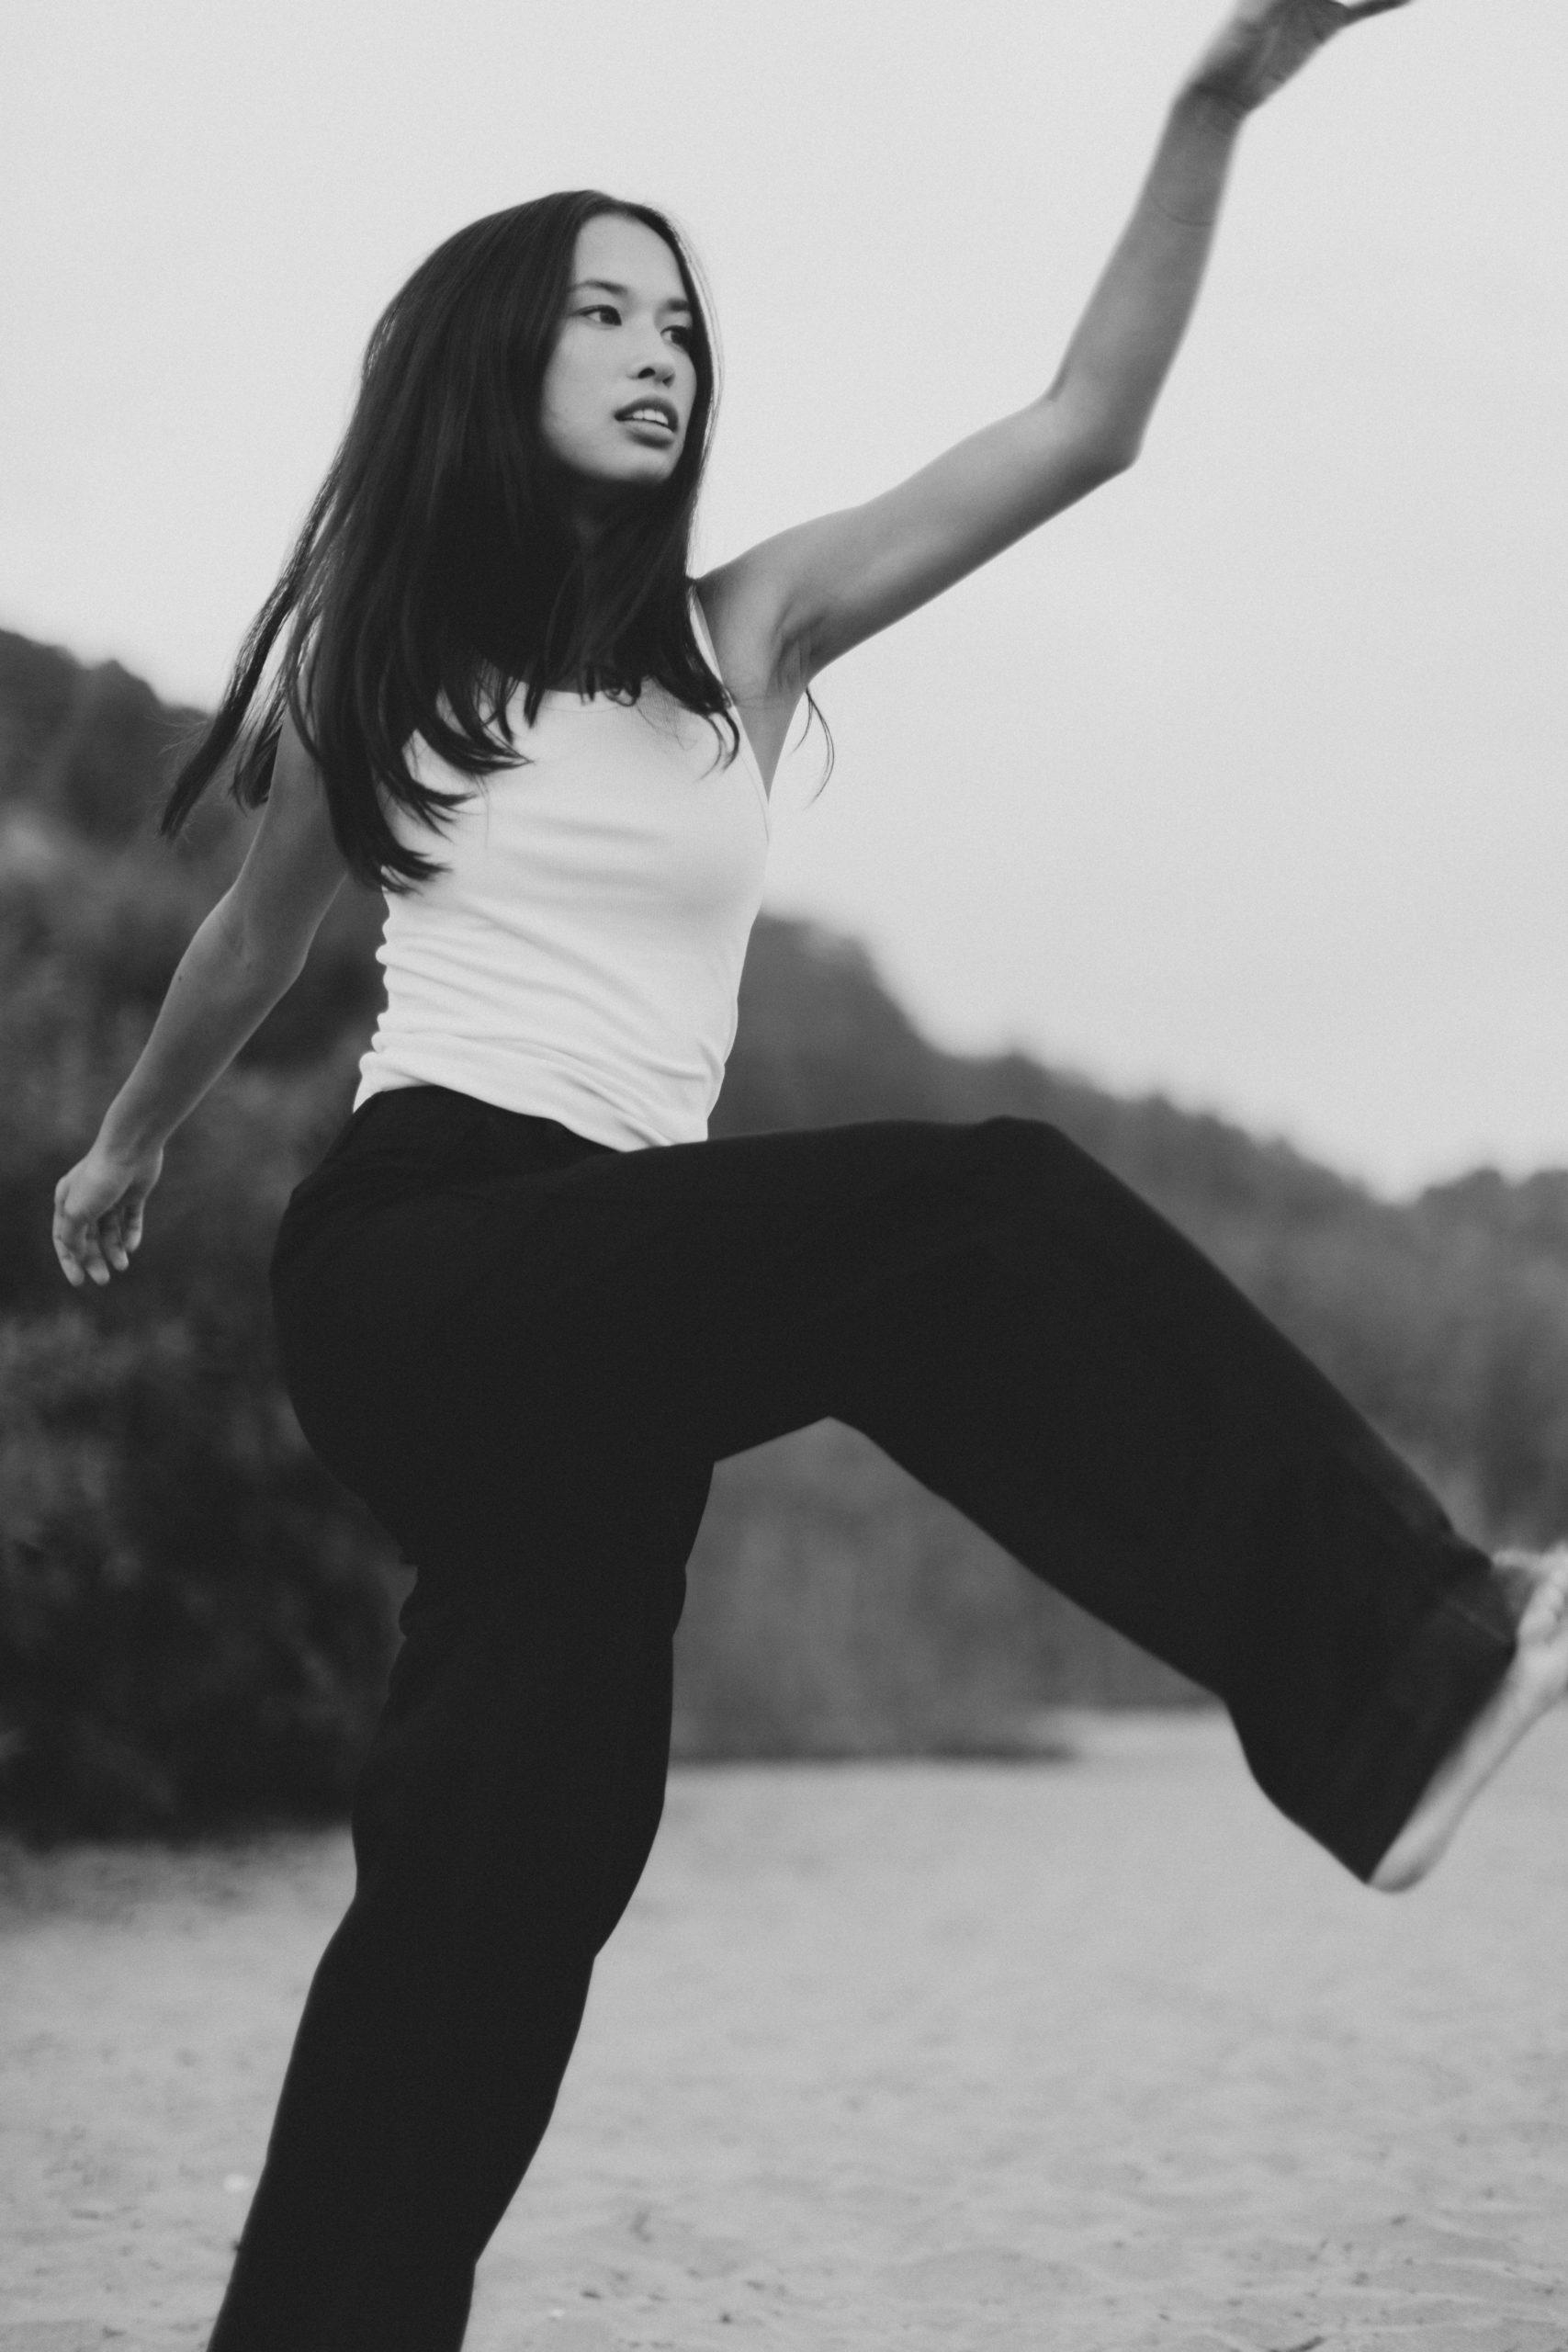 Estyr Photographed by Ashley Klassen